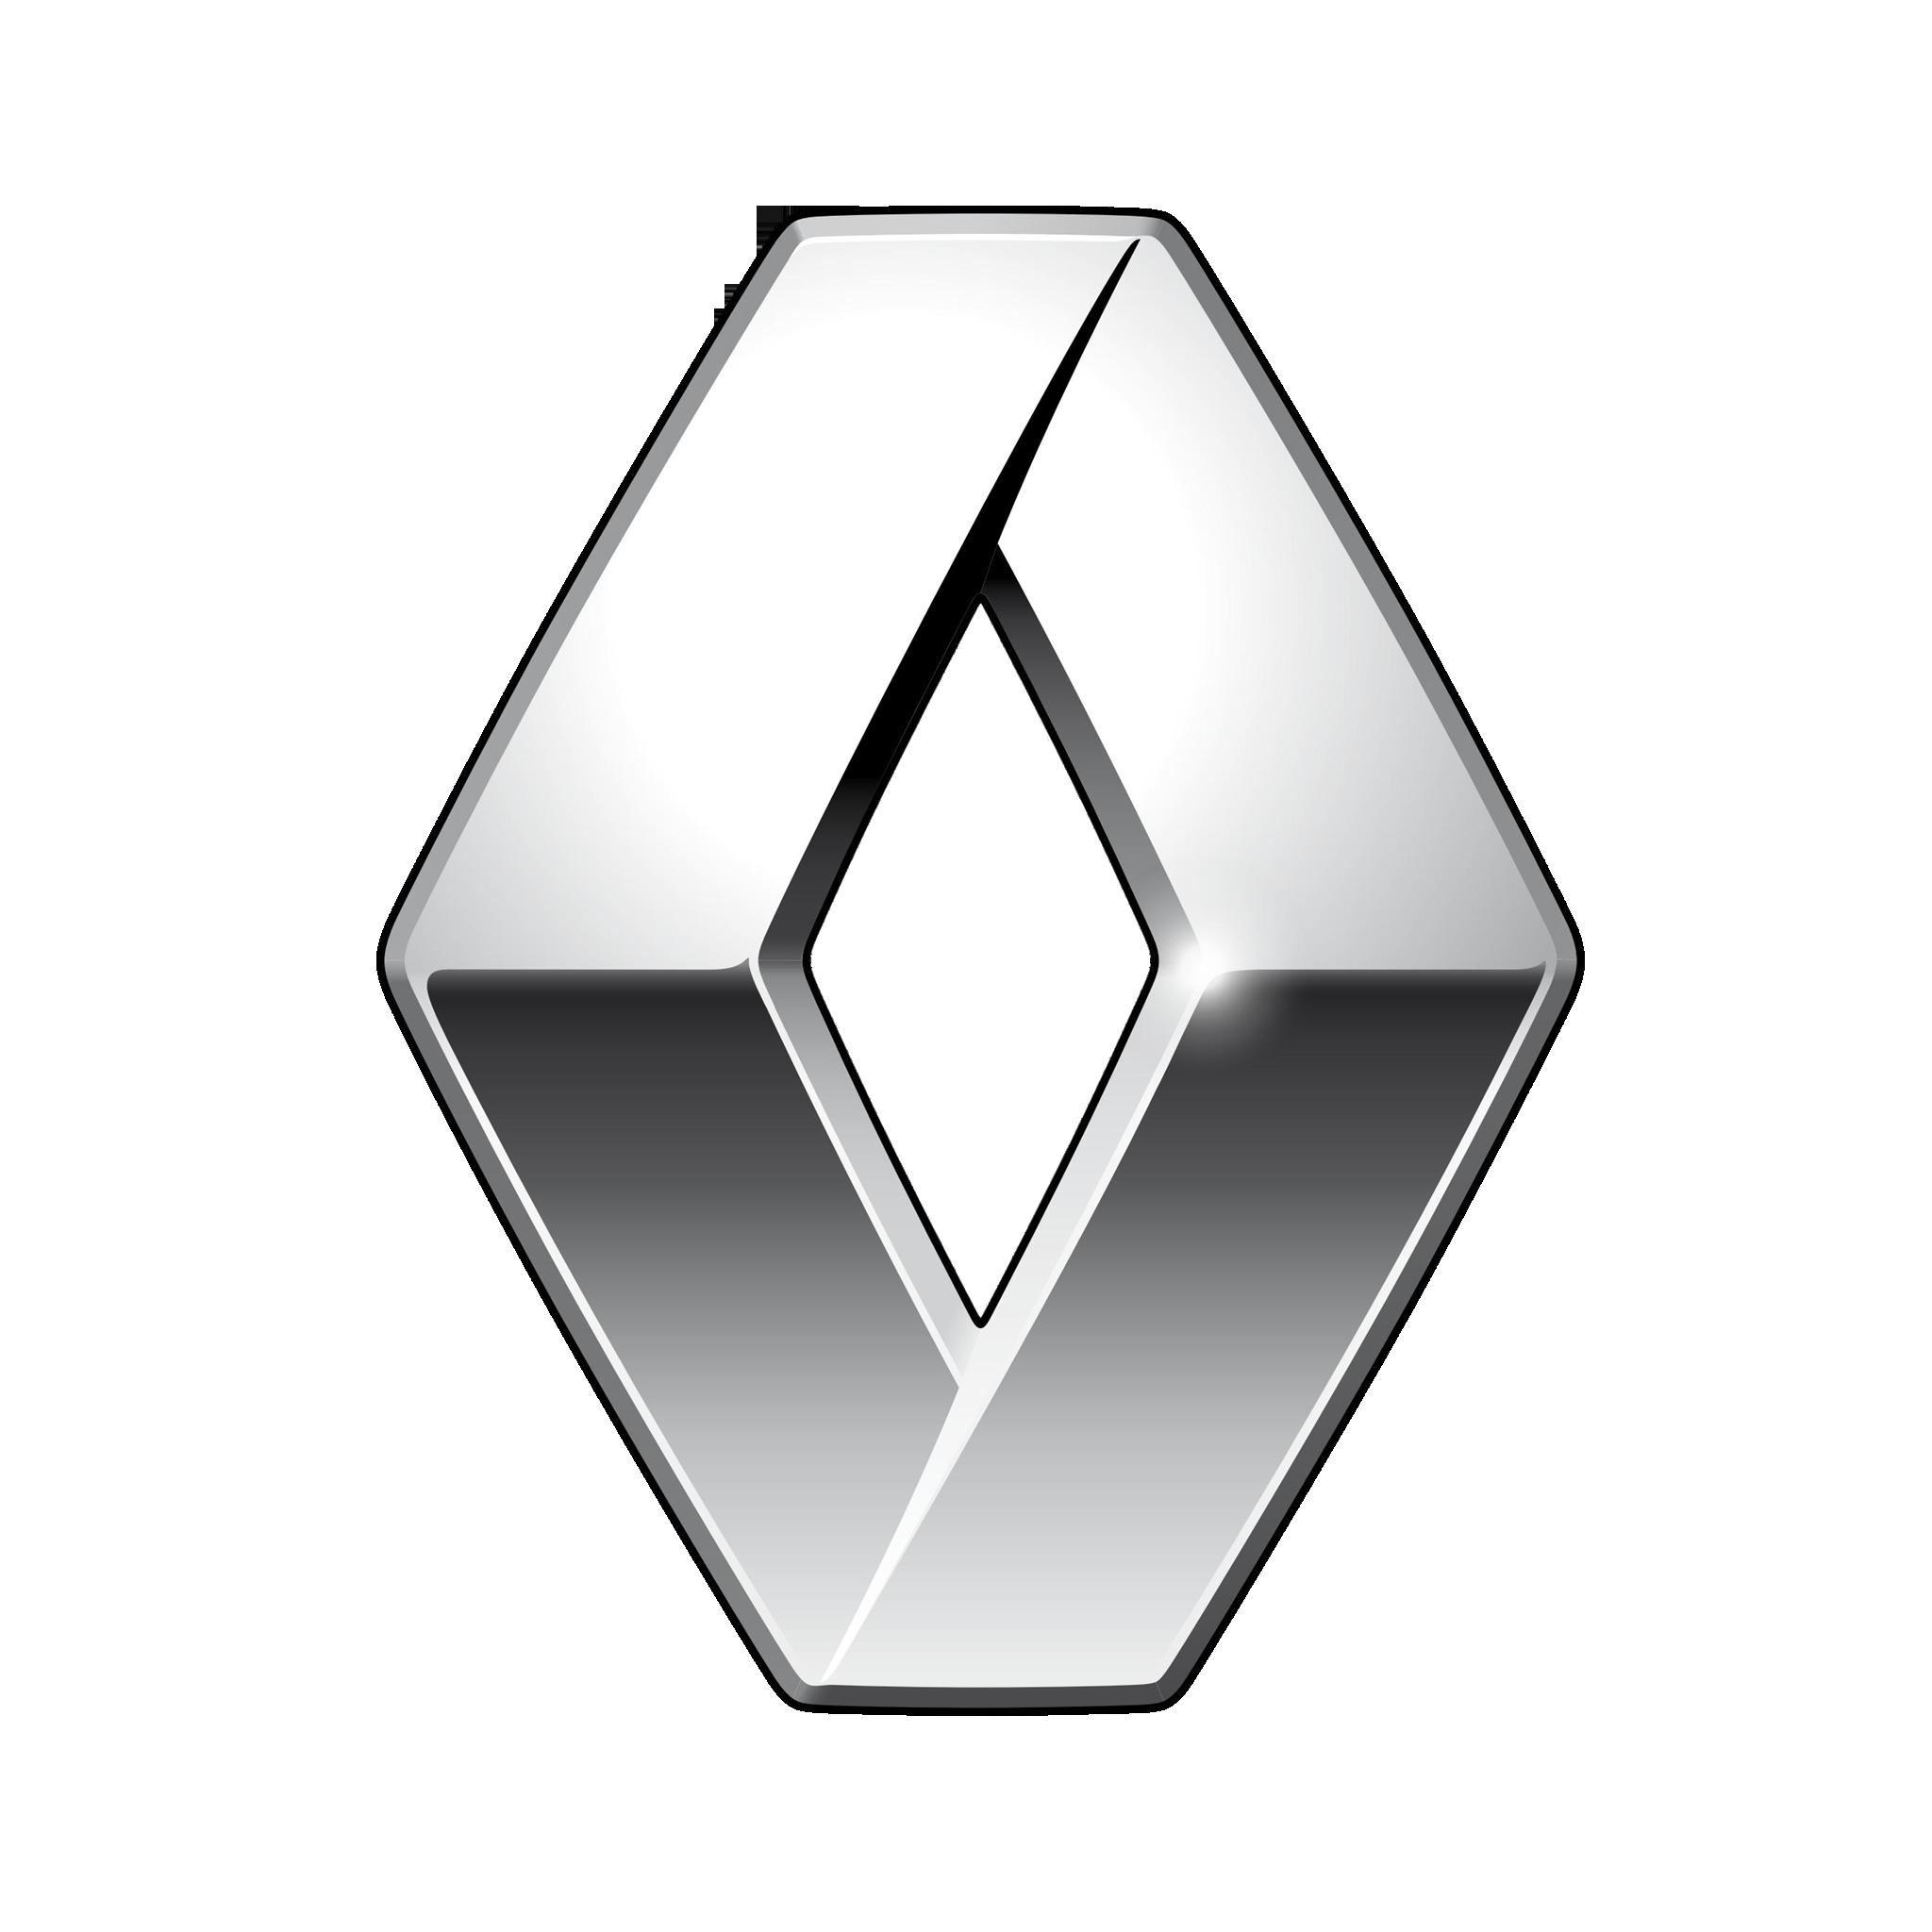 Risultati immagini per renault logo png